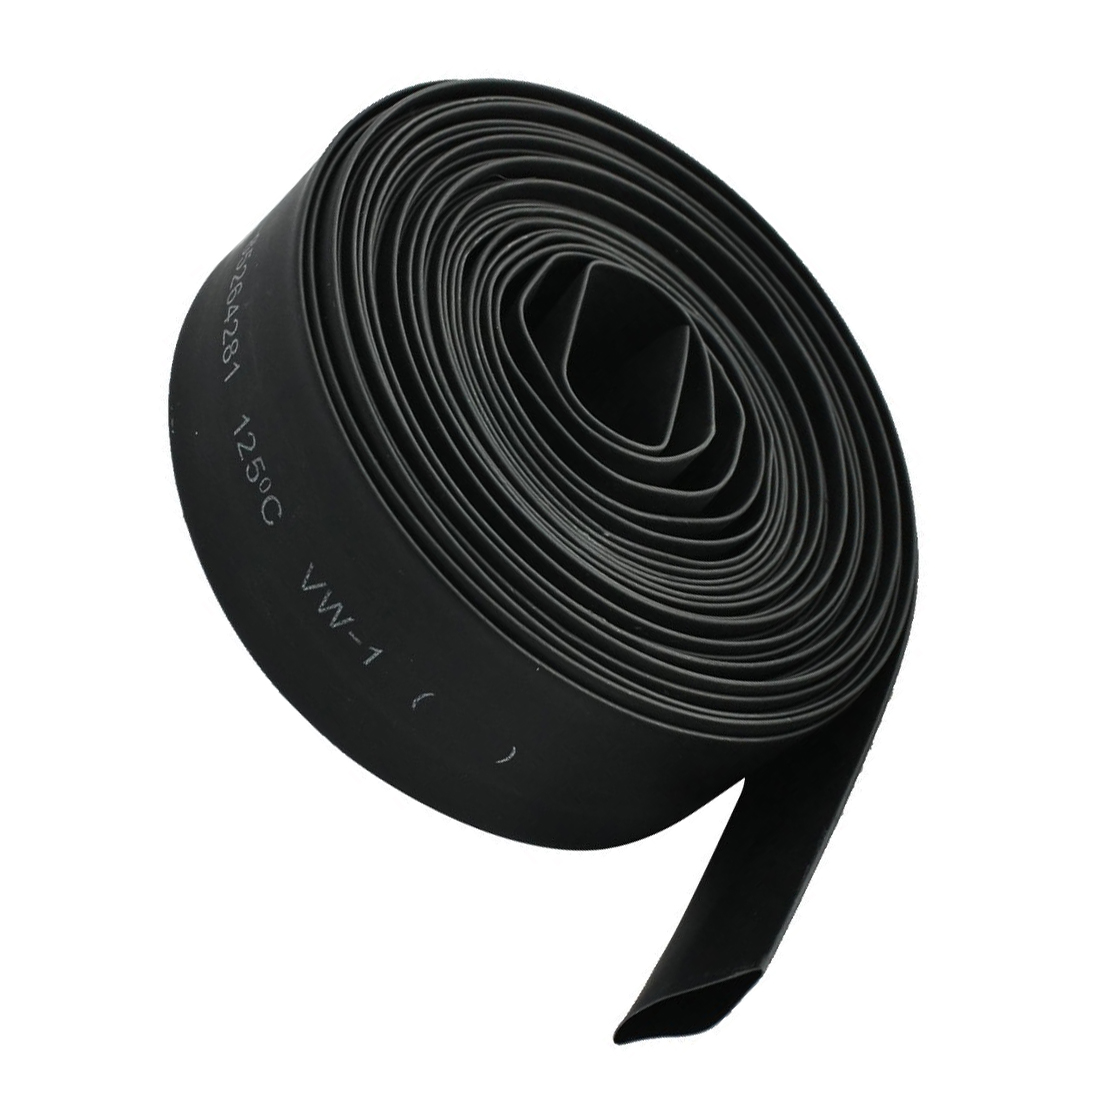 KSOL 2mm/6M 15mm/5M 30mm/1M 70mm/1M 8mm/5M 5mm/6M 12mm/10M 2:1 Black Polyolefin Insulation Heat Shrink Tubing ksol 2mm 6m 15mm 5m 30mm 1m 70mm 1m 8mm 5m 5mm 6m 12mm 10m 2 1 black polyolefin insulation heat shrink tubing